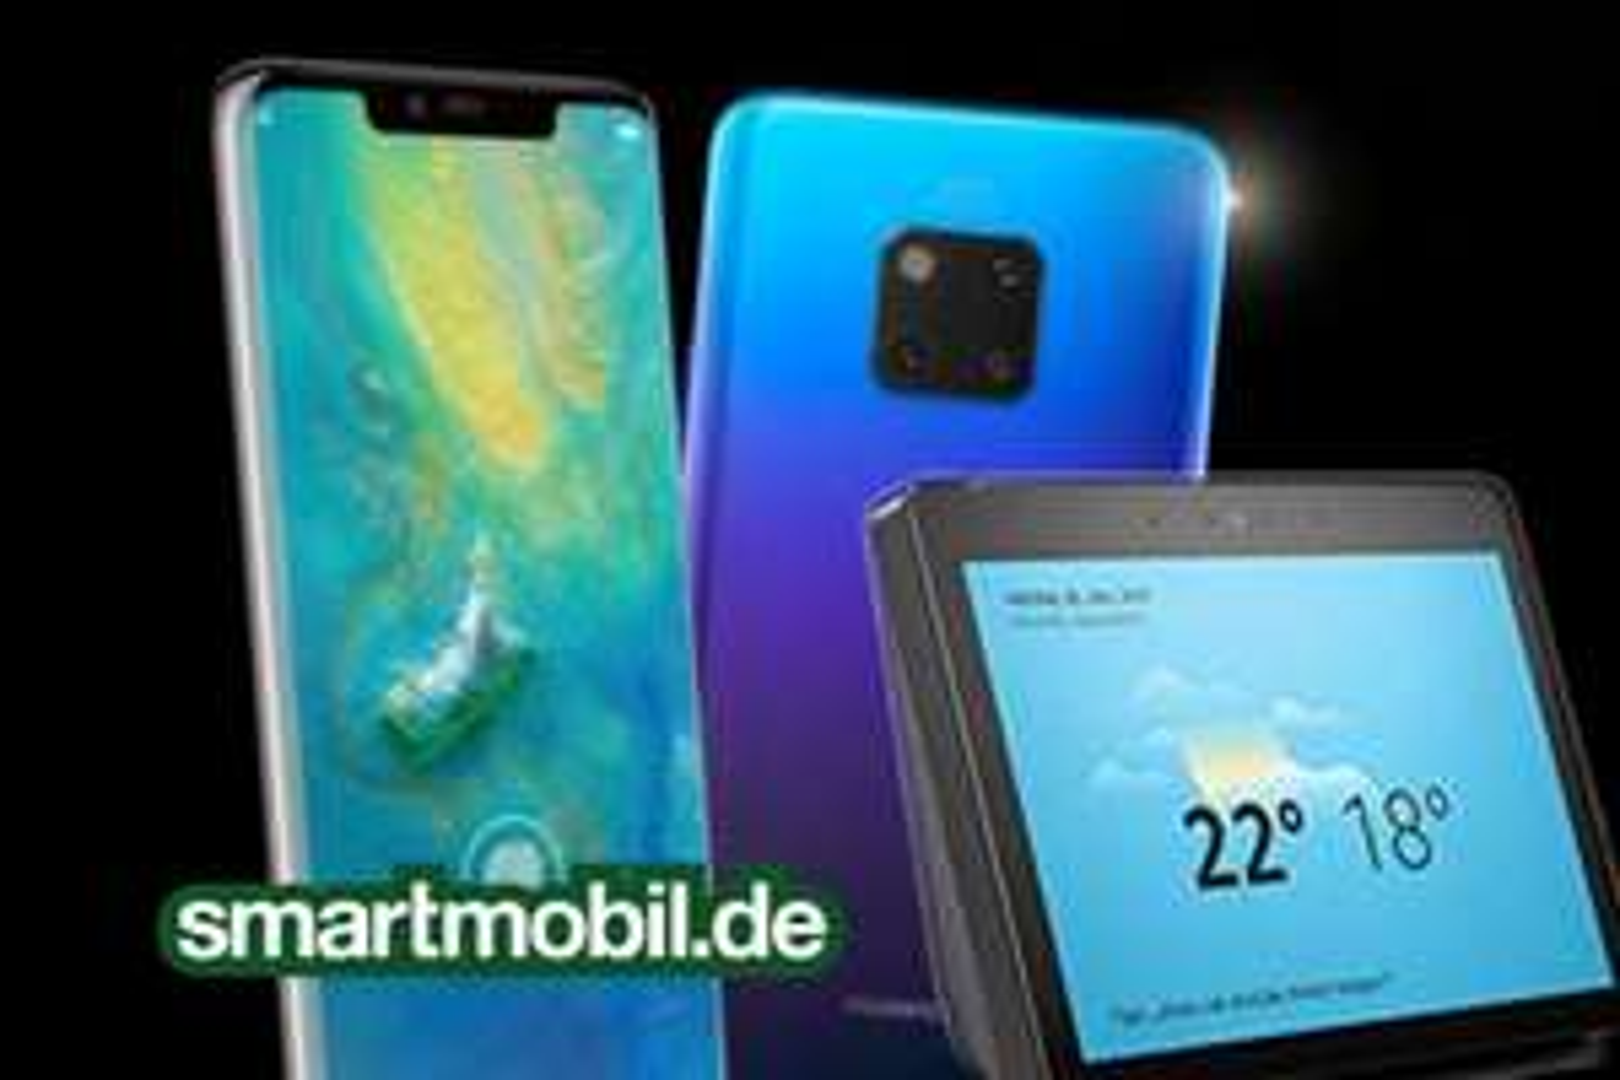 Huawei Mate 20 Pro 128GB + Amazon Echo Show 2.Gen + Smartmobil LTE Special mit 2GB LTE im O2-Netz